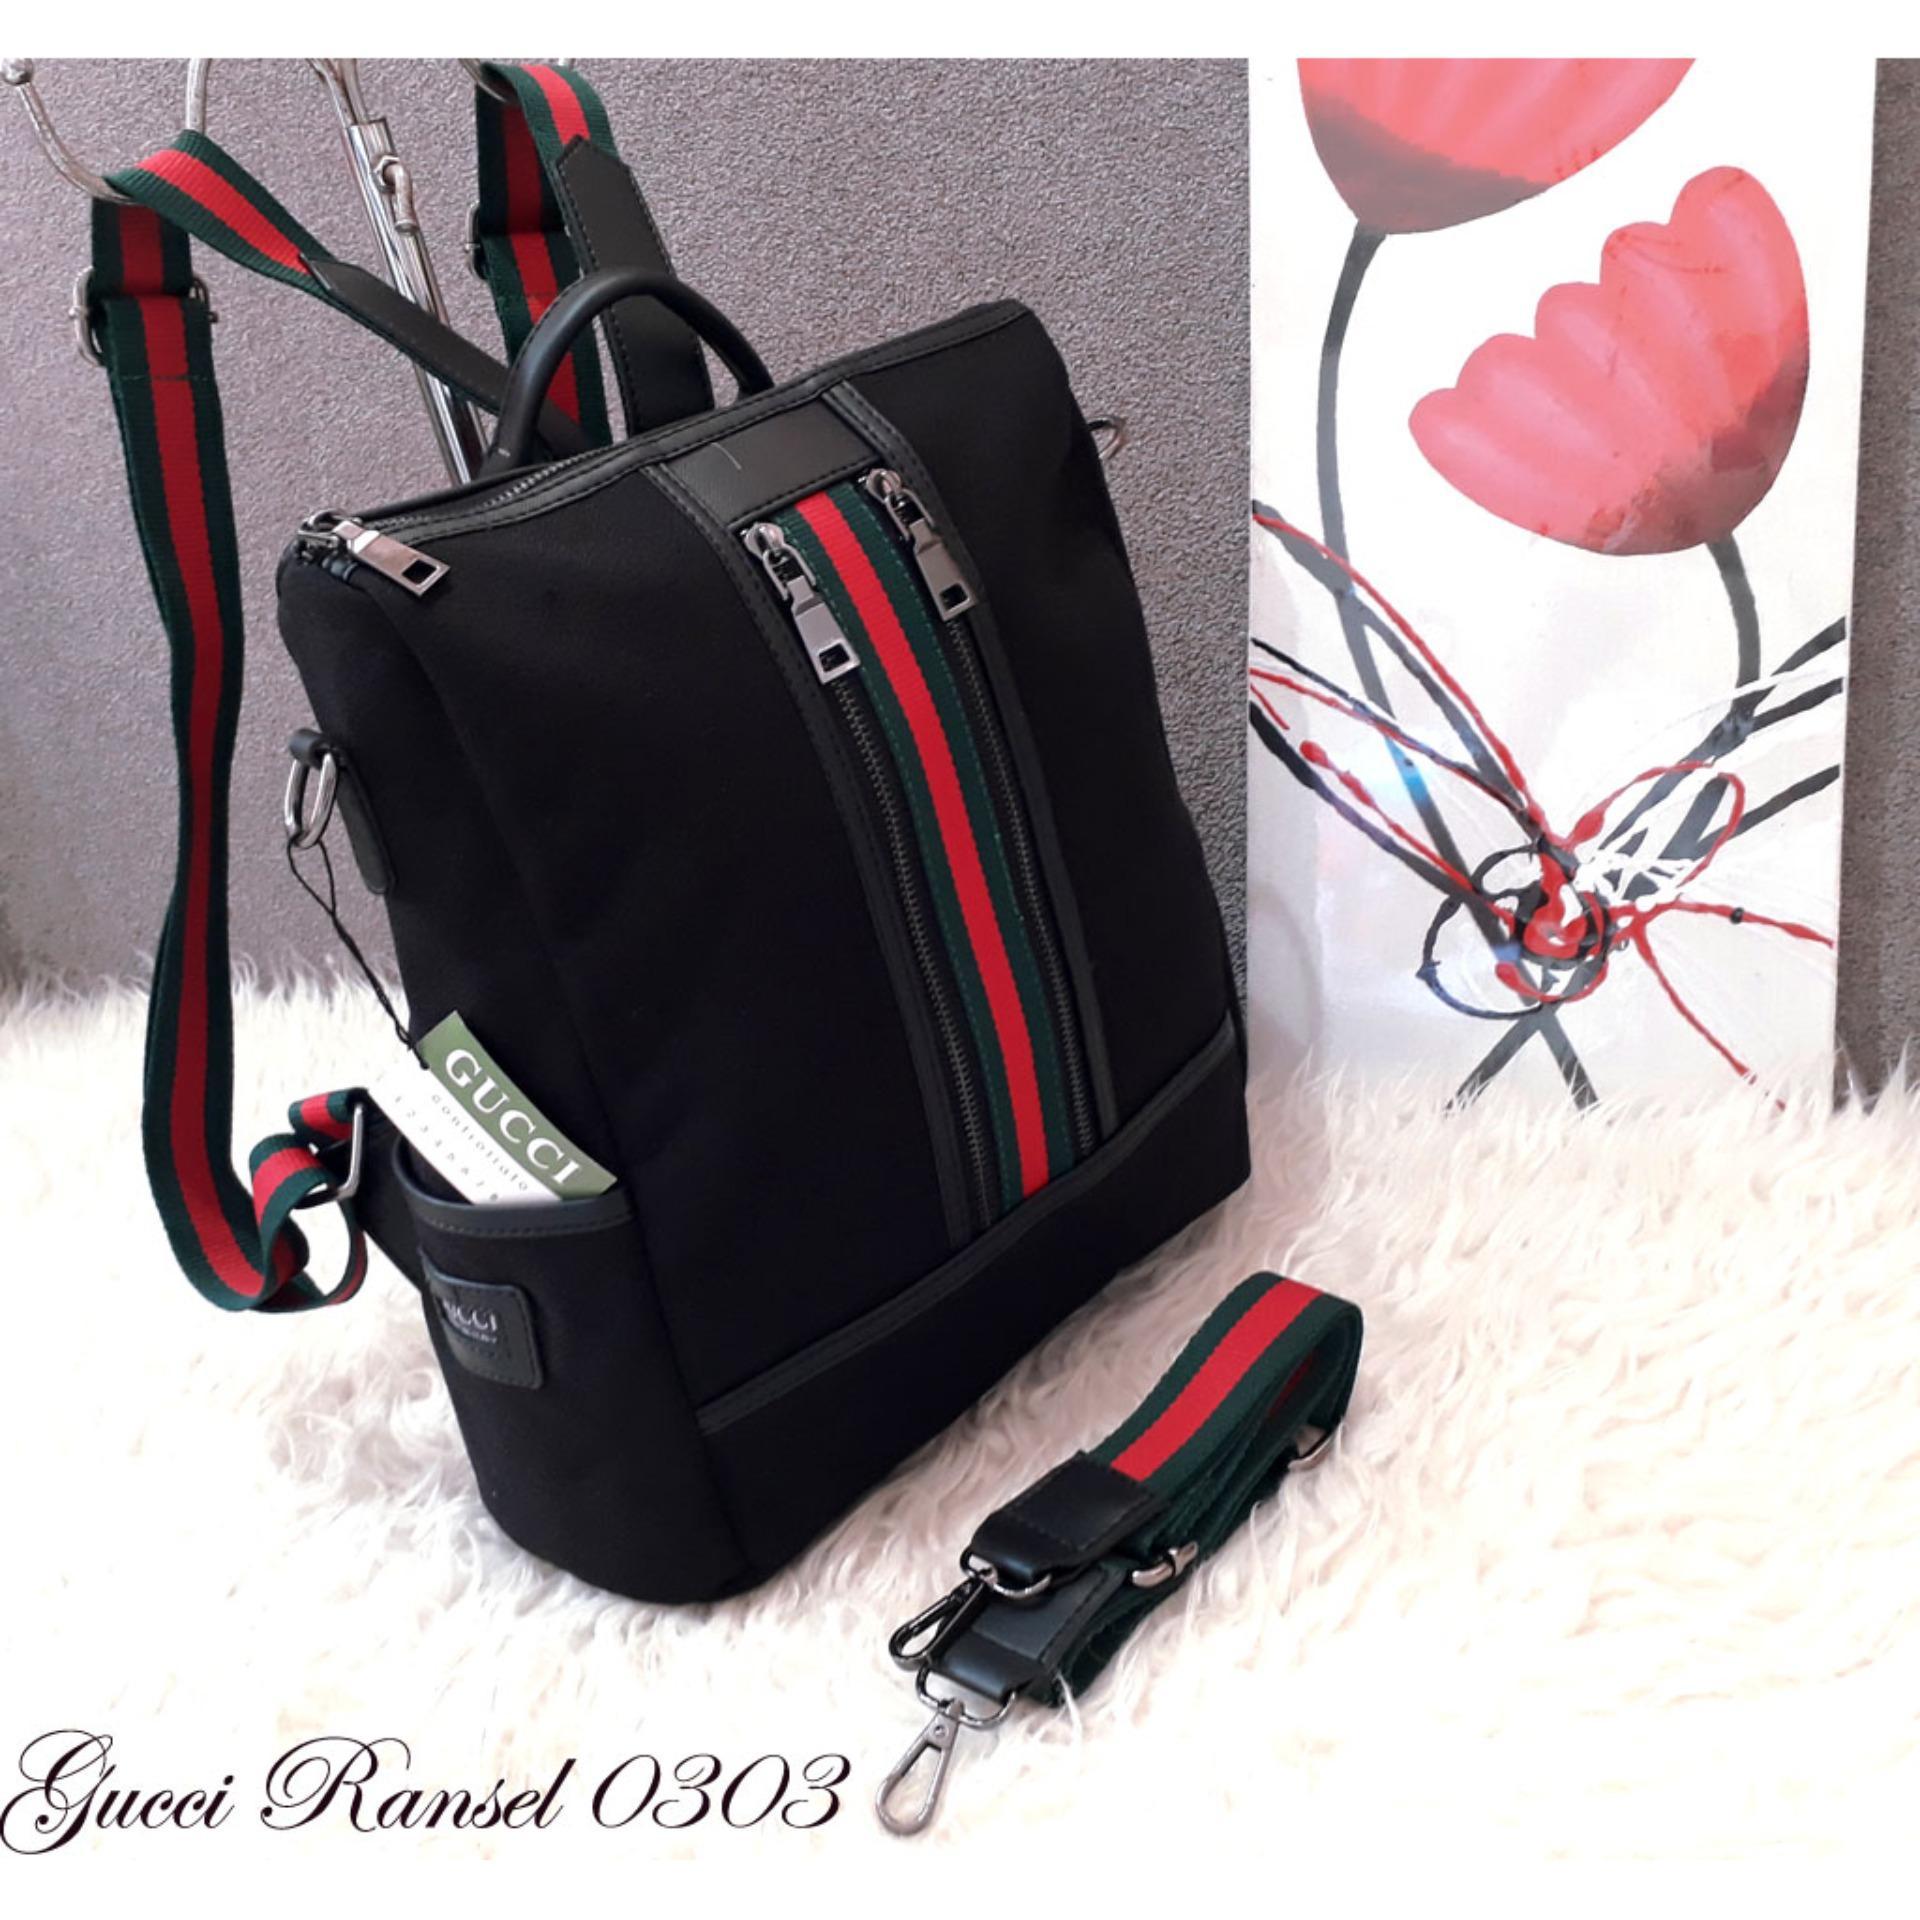 Tas Fashion Paket 3 In 1 Ransel Motif Dot Warna Merah Daftar Wanita Flower Rumbe 3in1 Backpacks